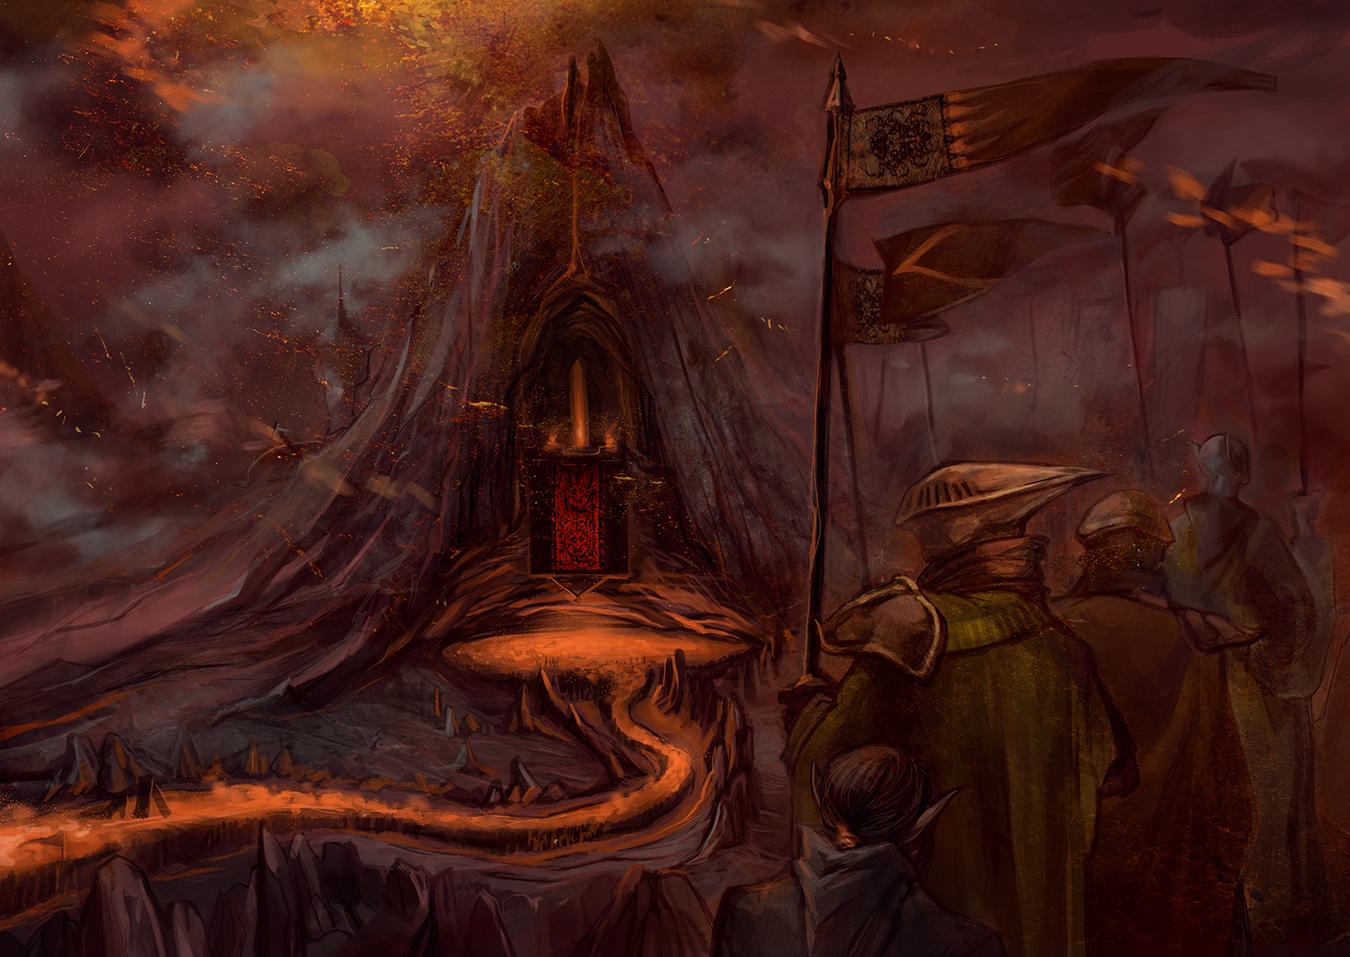 Skyrim Iphone X Wallpaper The Elder Scrolls Iii Morrowind Wallpaper And Background